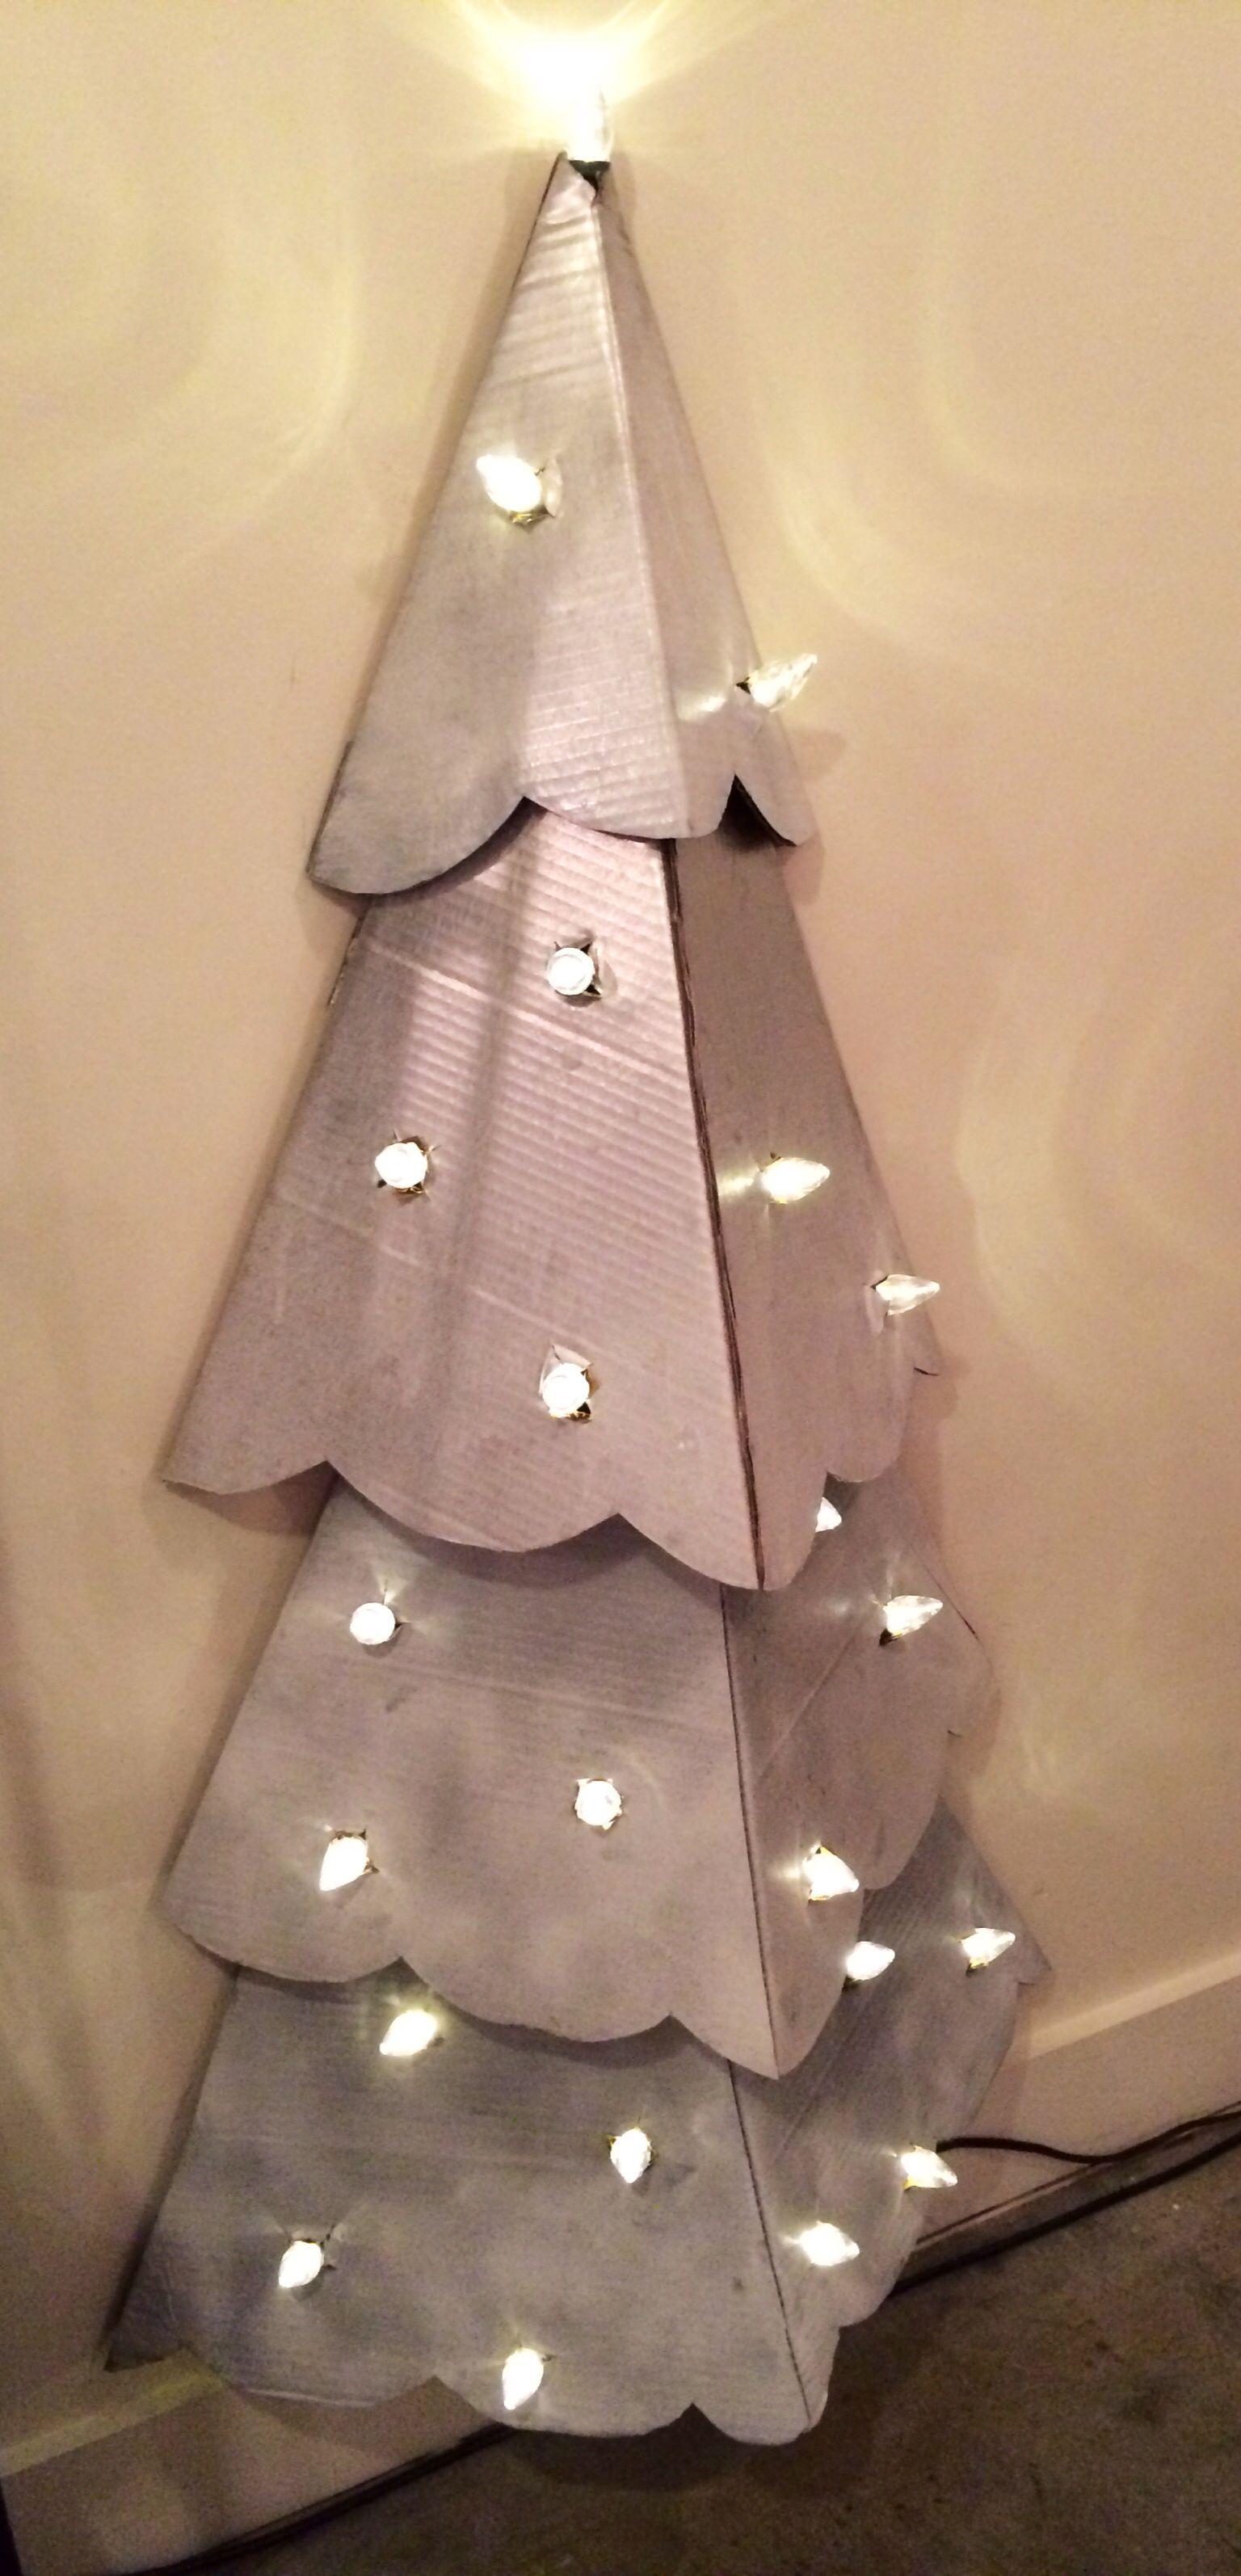 Diy Christmas Tree Cardboard And Lights Wall Christmas Tree Diy Christmas Tree Cardboard Christmas Tree